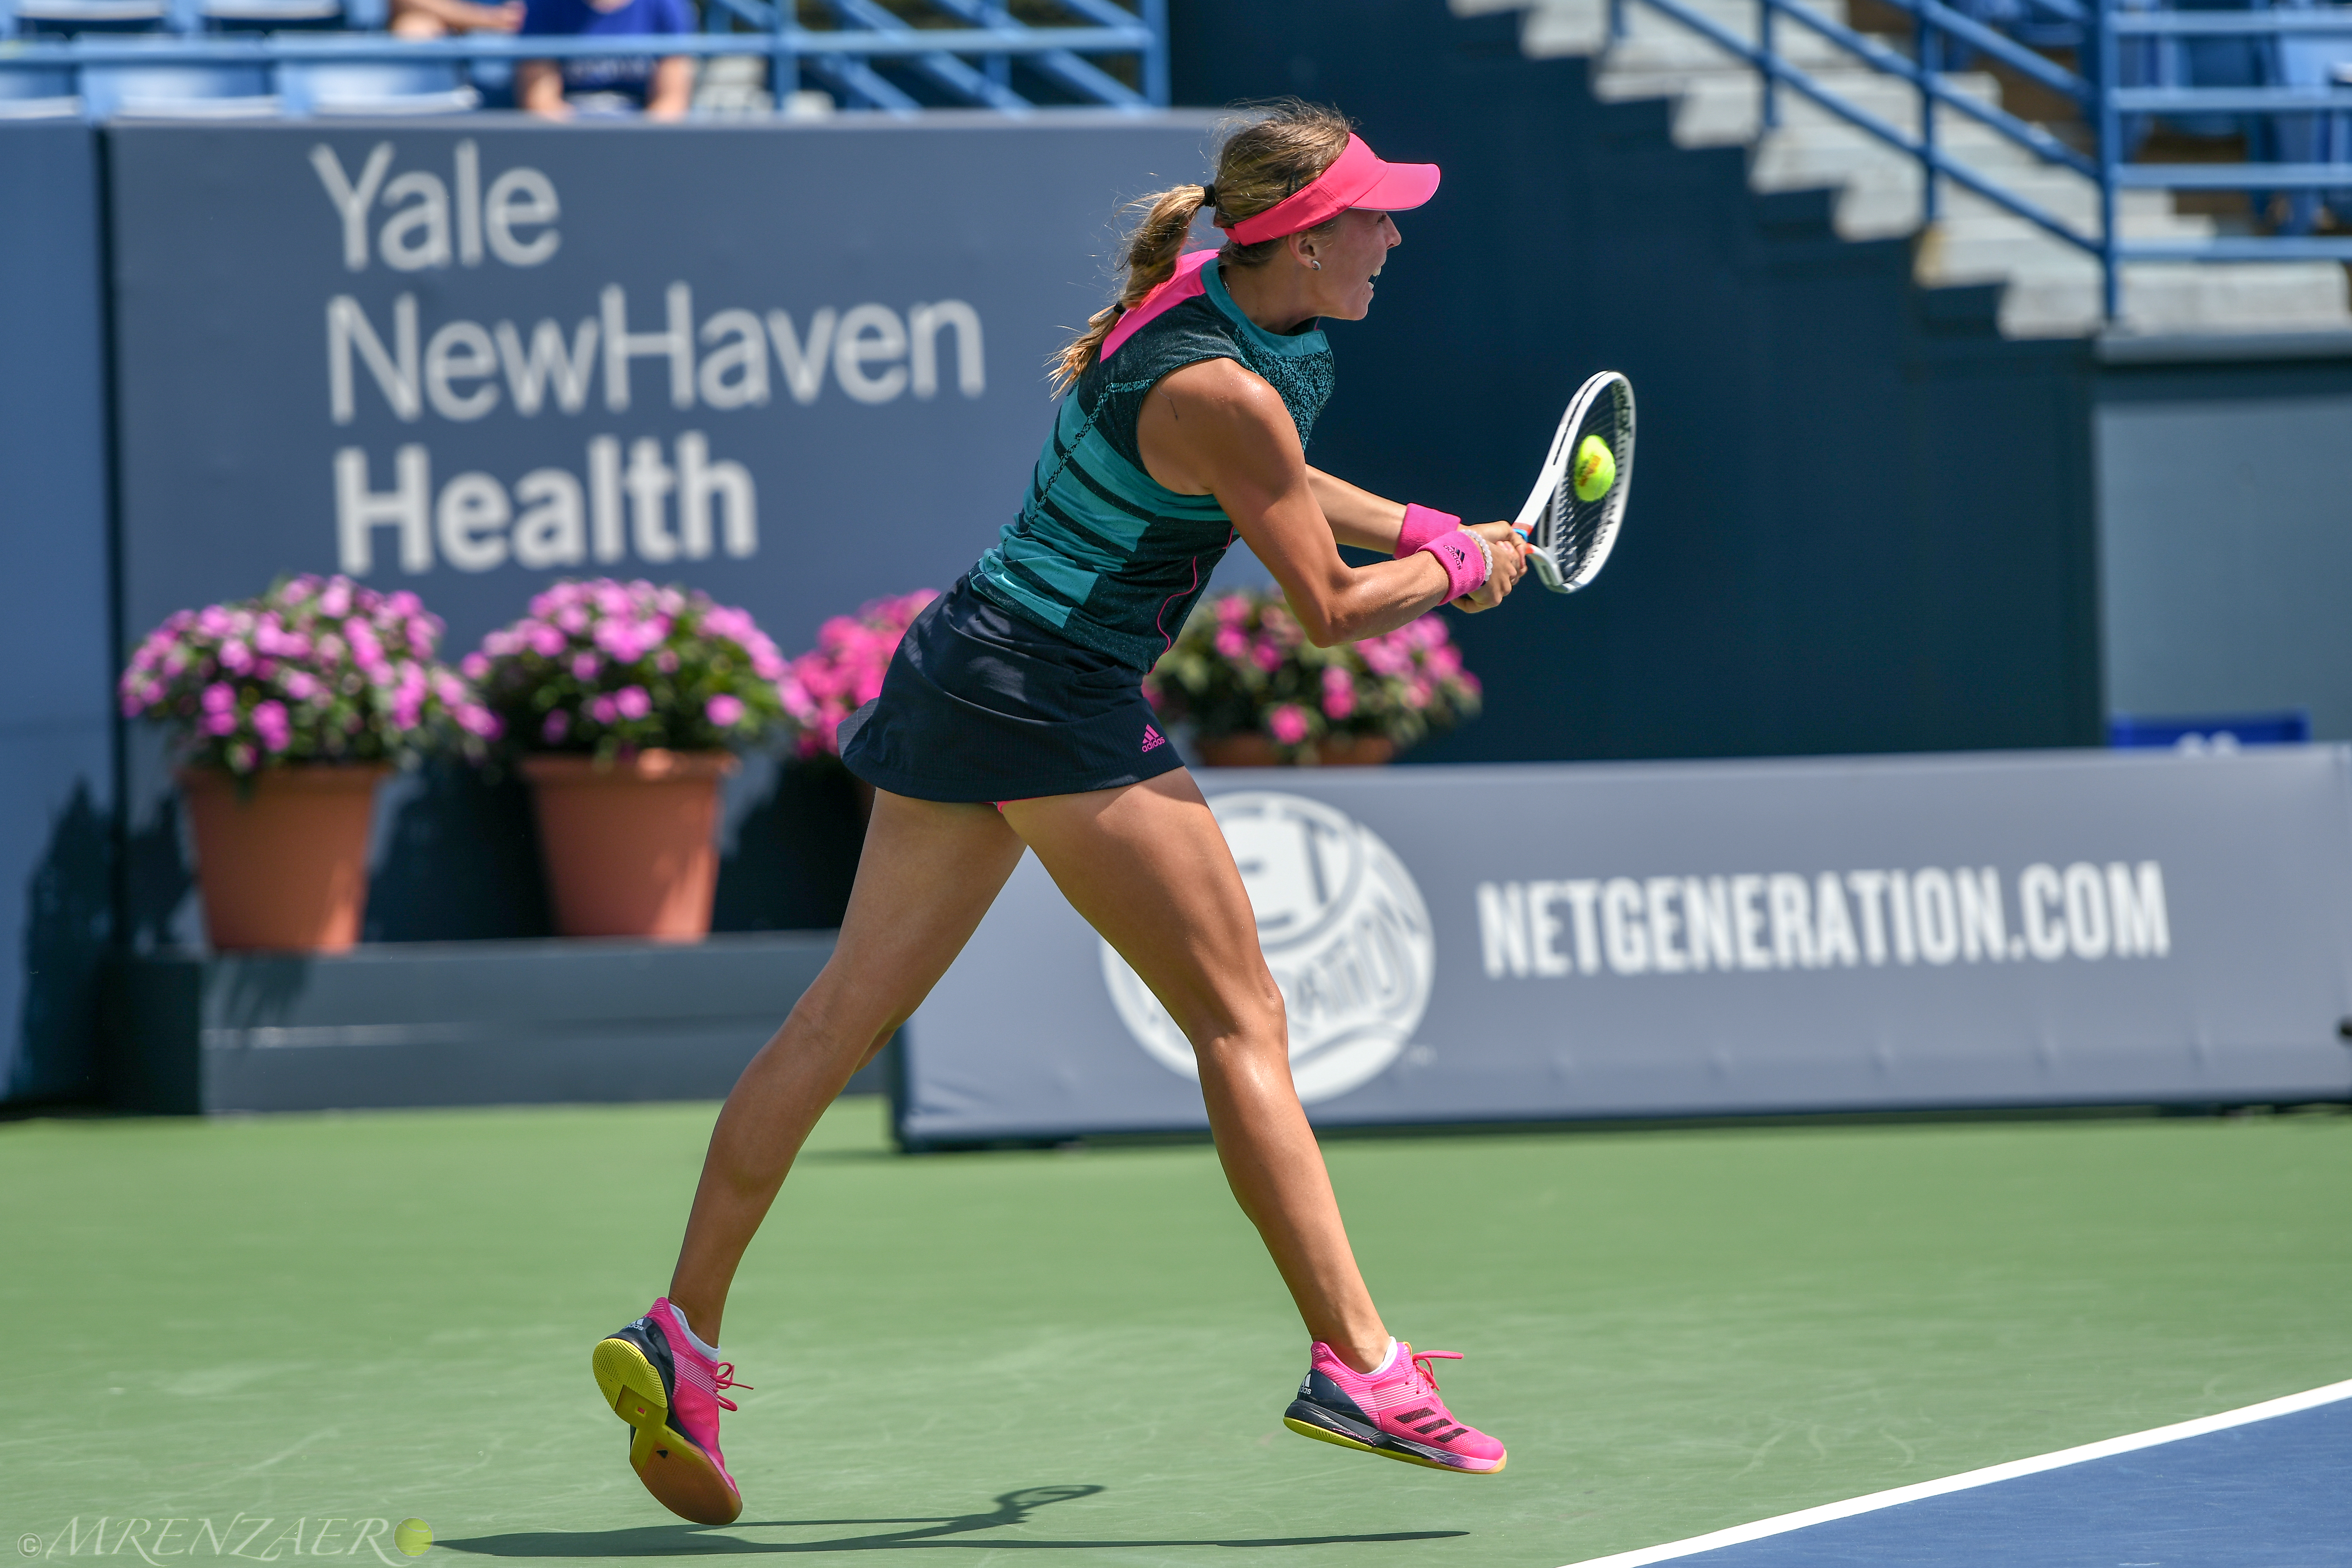 Anett Kontaveit, 2018 Connecticut Open (Photo: Mike Renz for Tennis Atlantic)